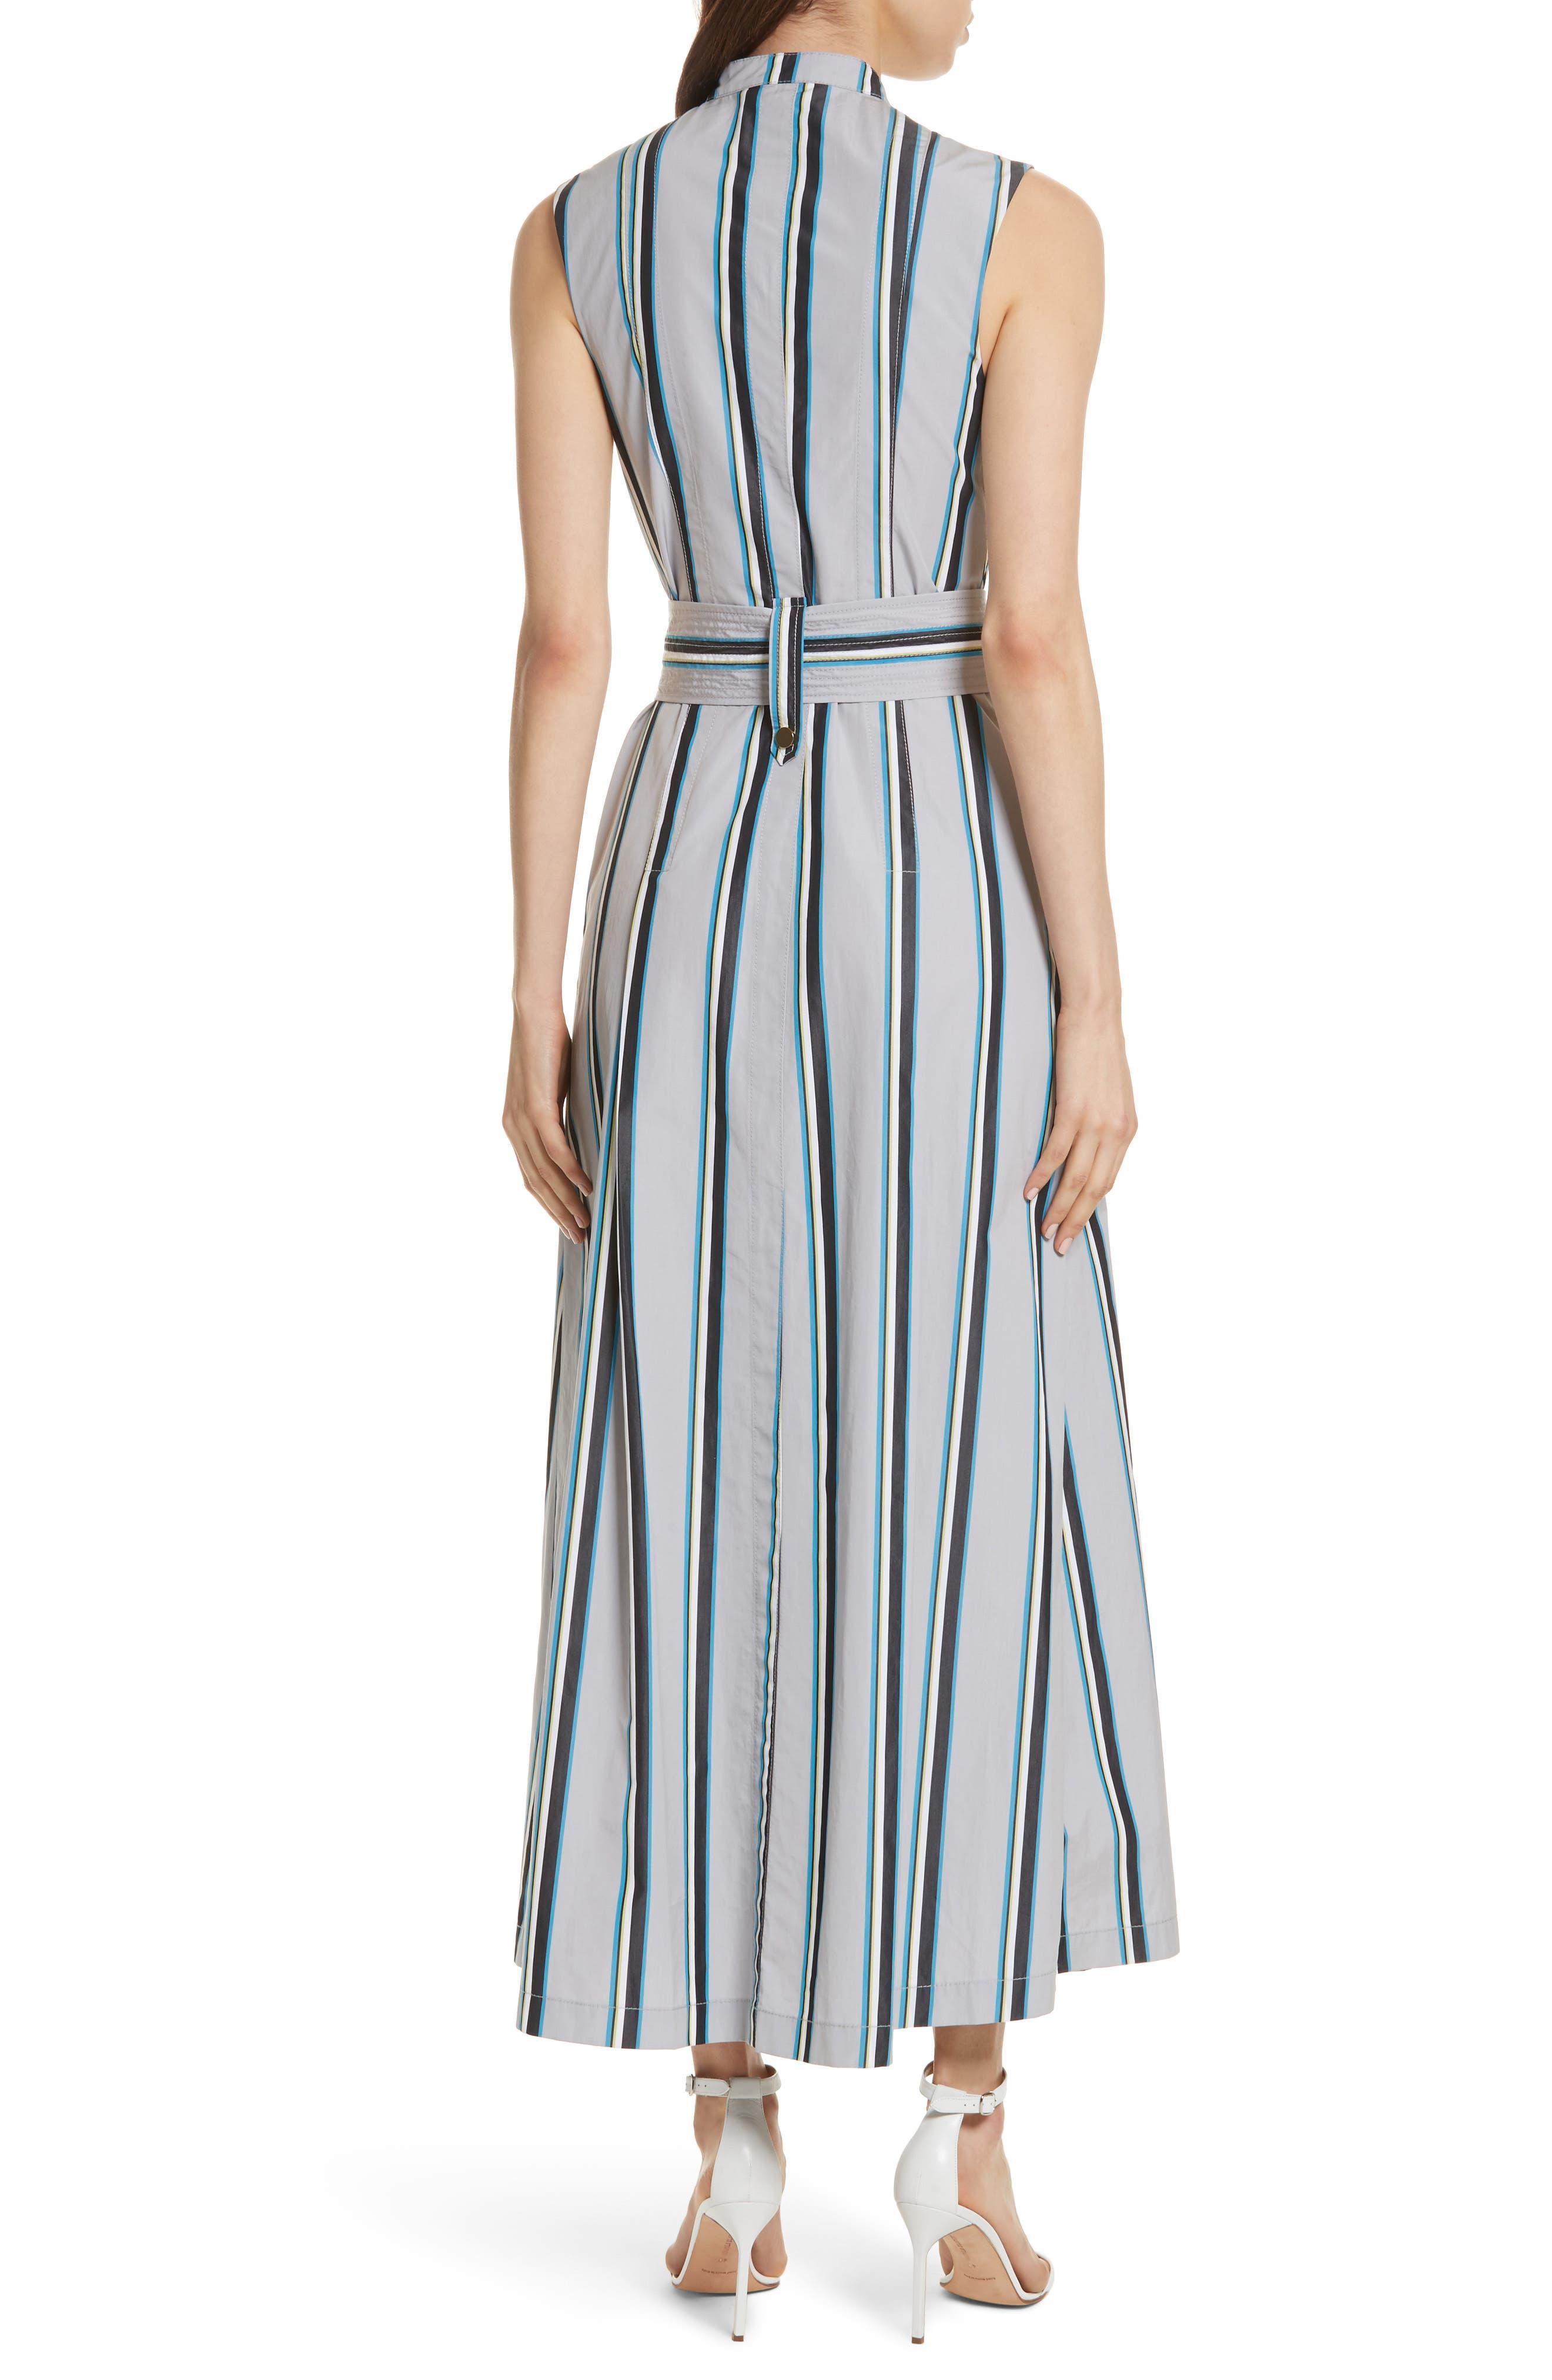 Diane von Furstenberg Stripe Belted Maxi Dress,                             Alternate thumbnail 2, color,                             Smoke Multi